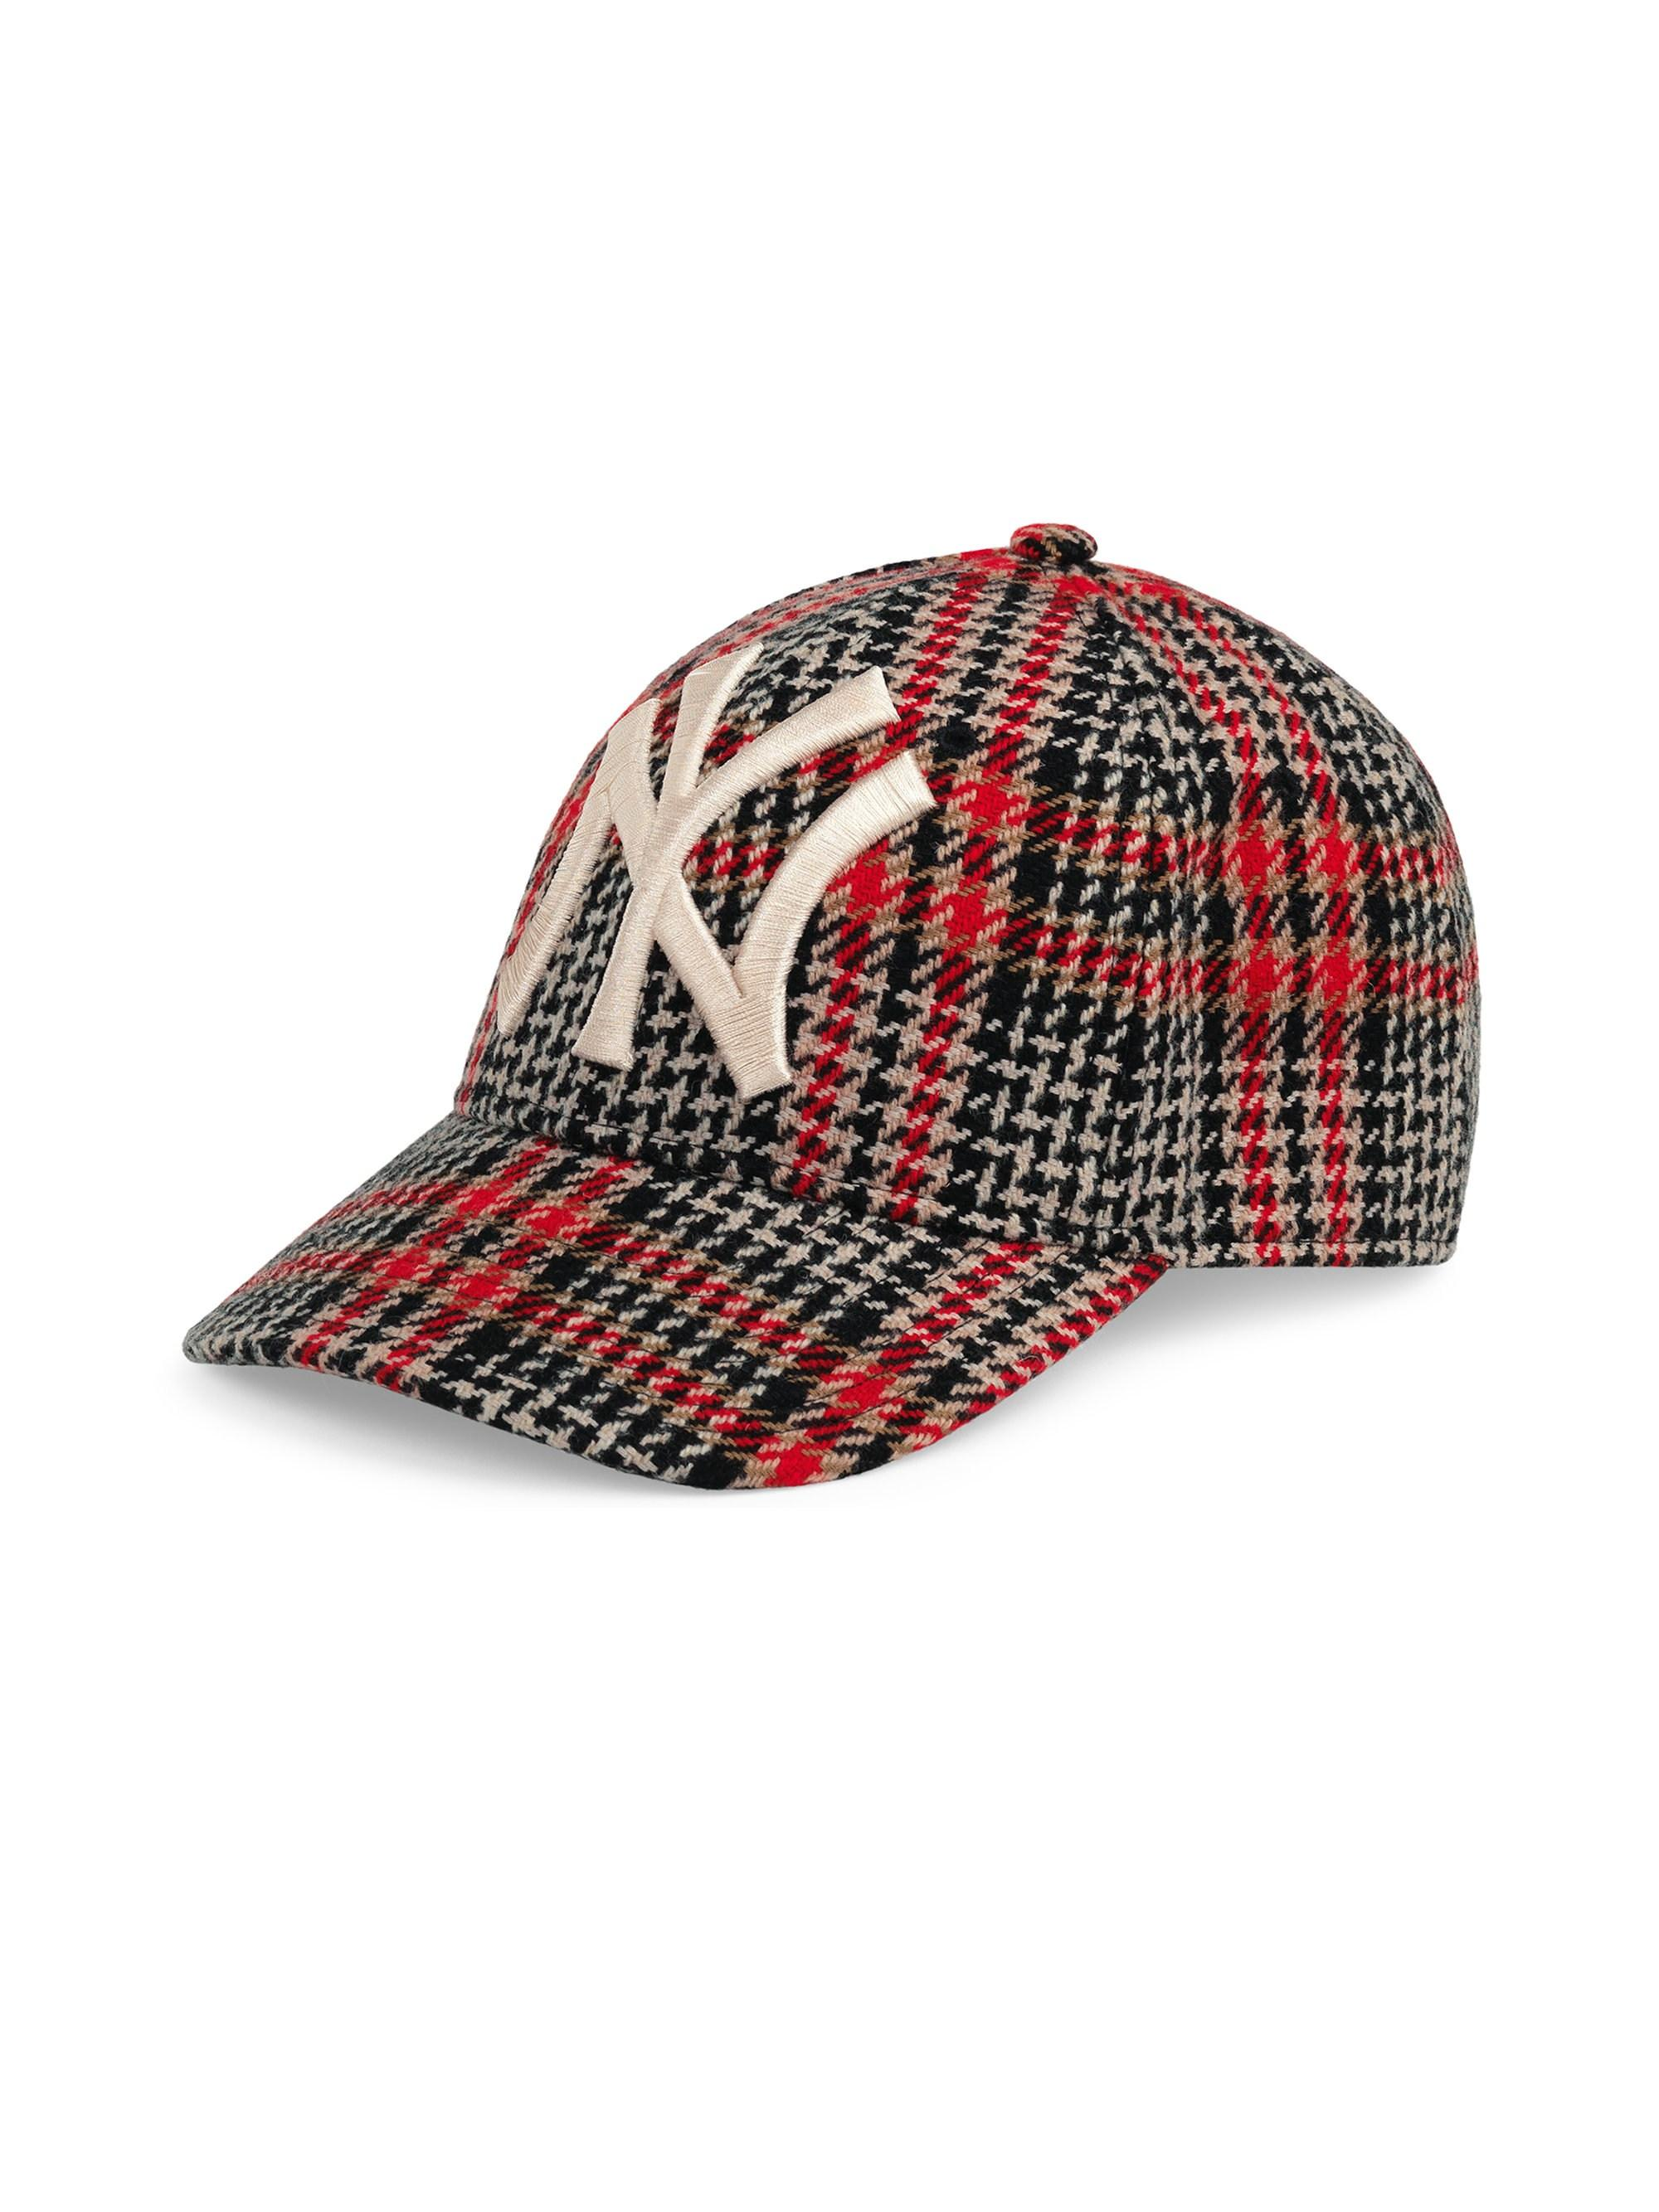 c060f45e Gucci Men's New York Yankees Diamante Baseball Cap - Black Red in ...